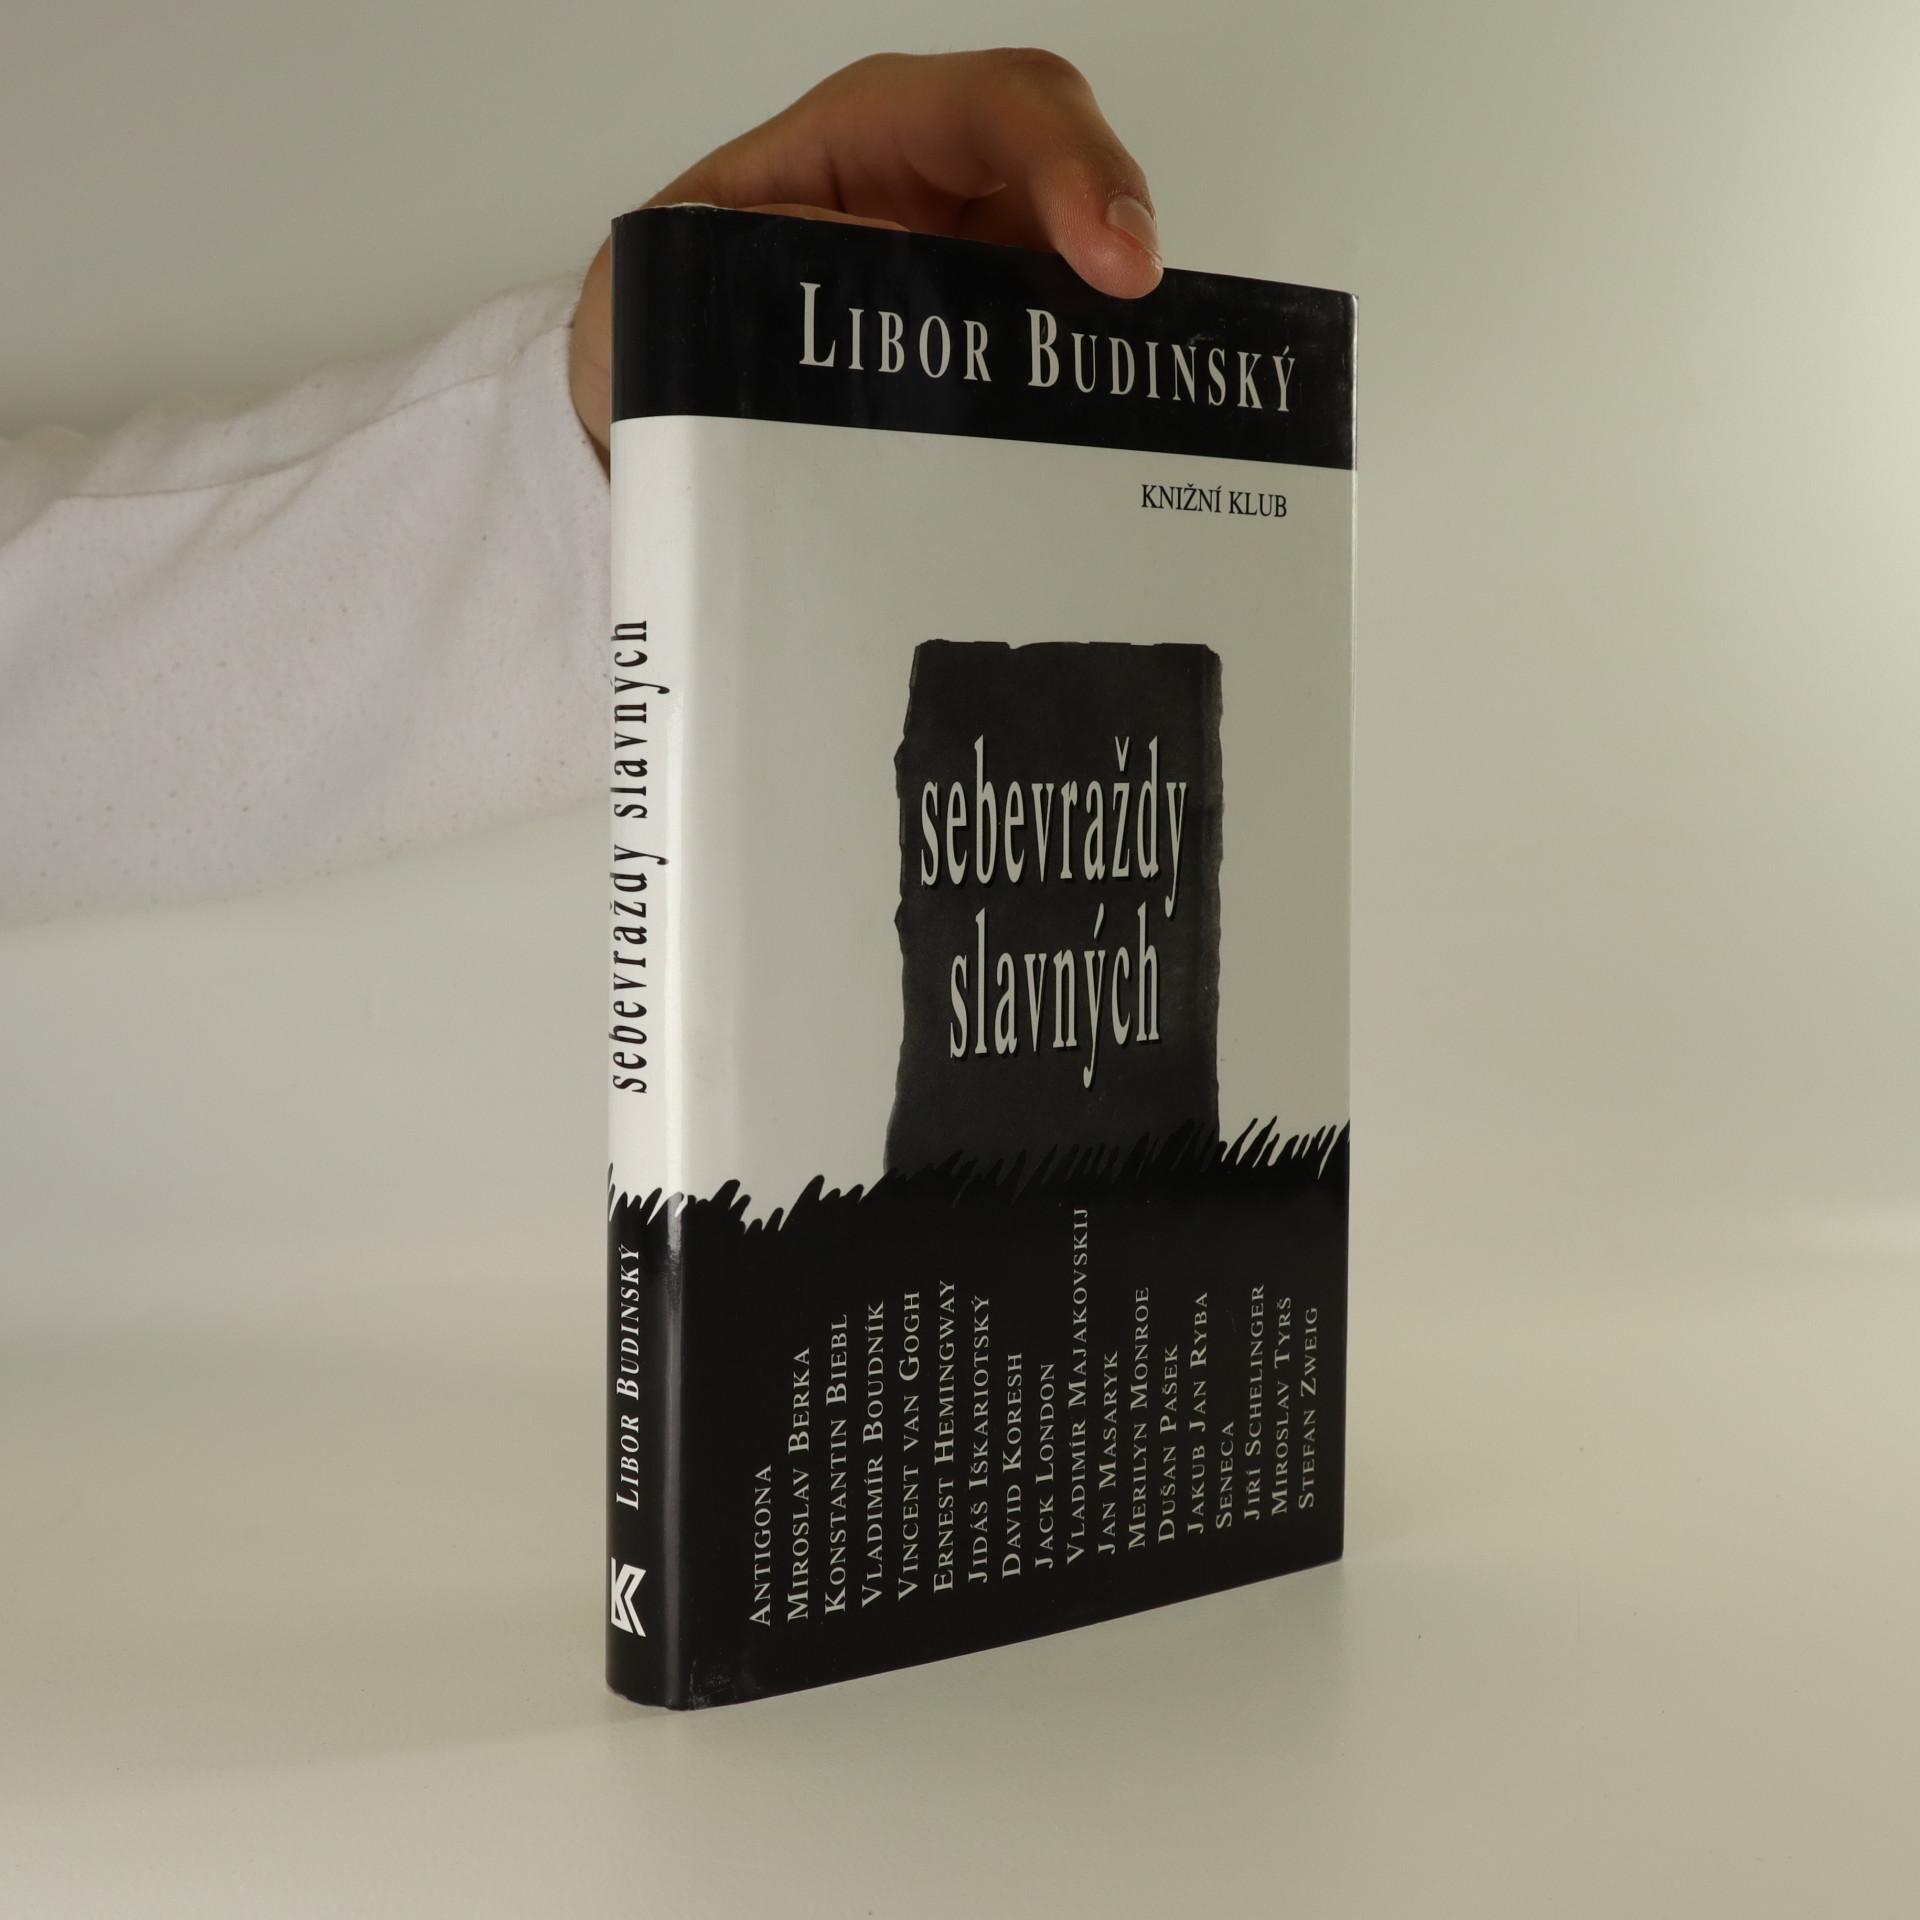 antikvární kniha Sebevraždy slavných, 2000